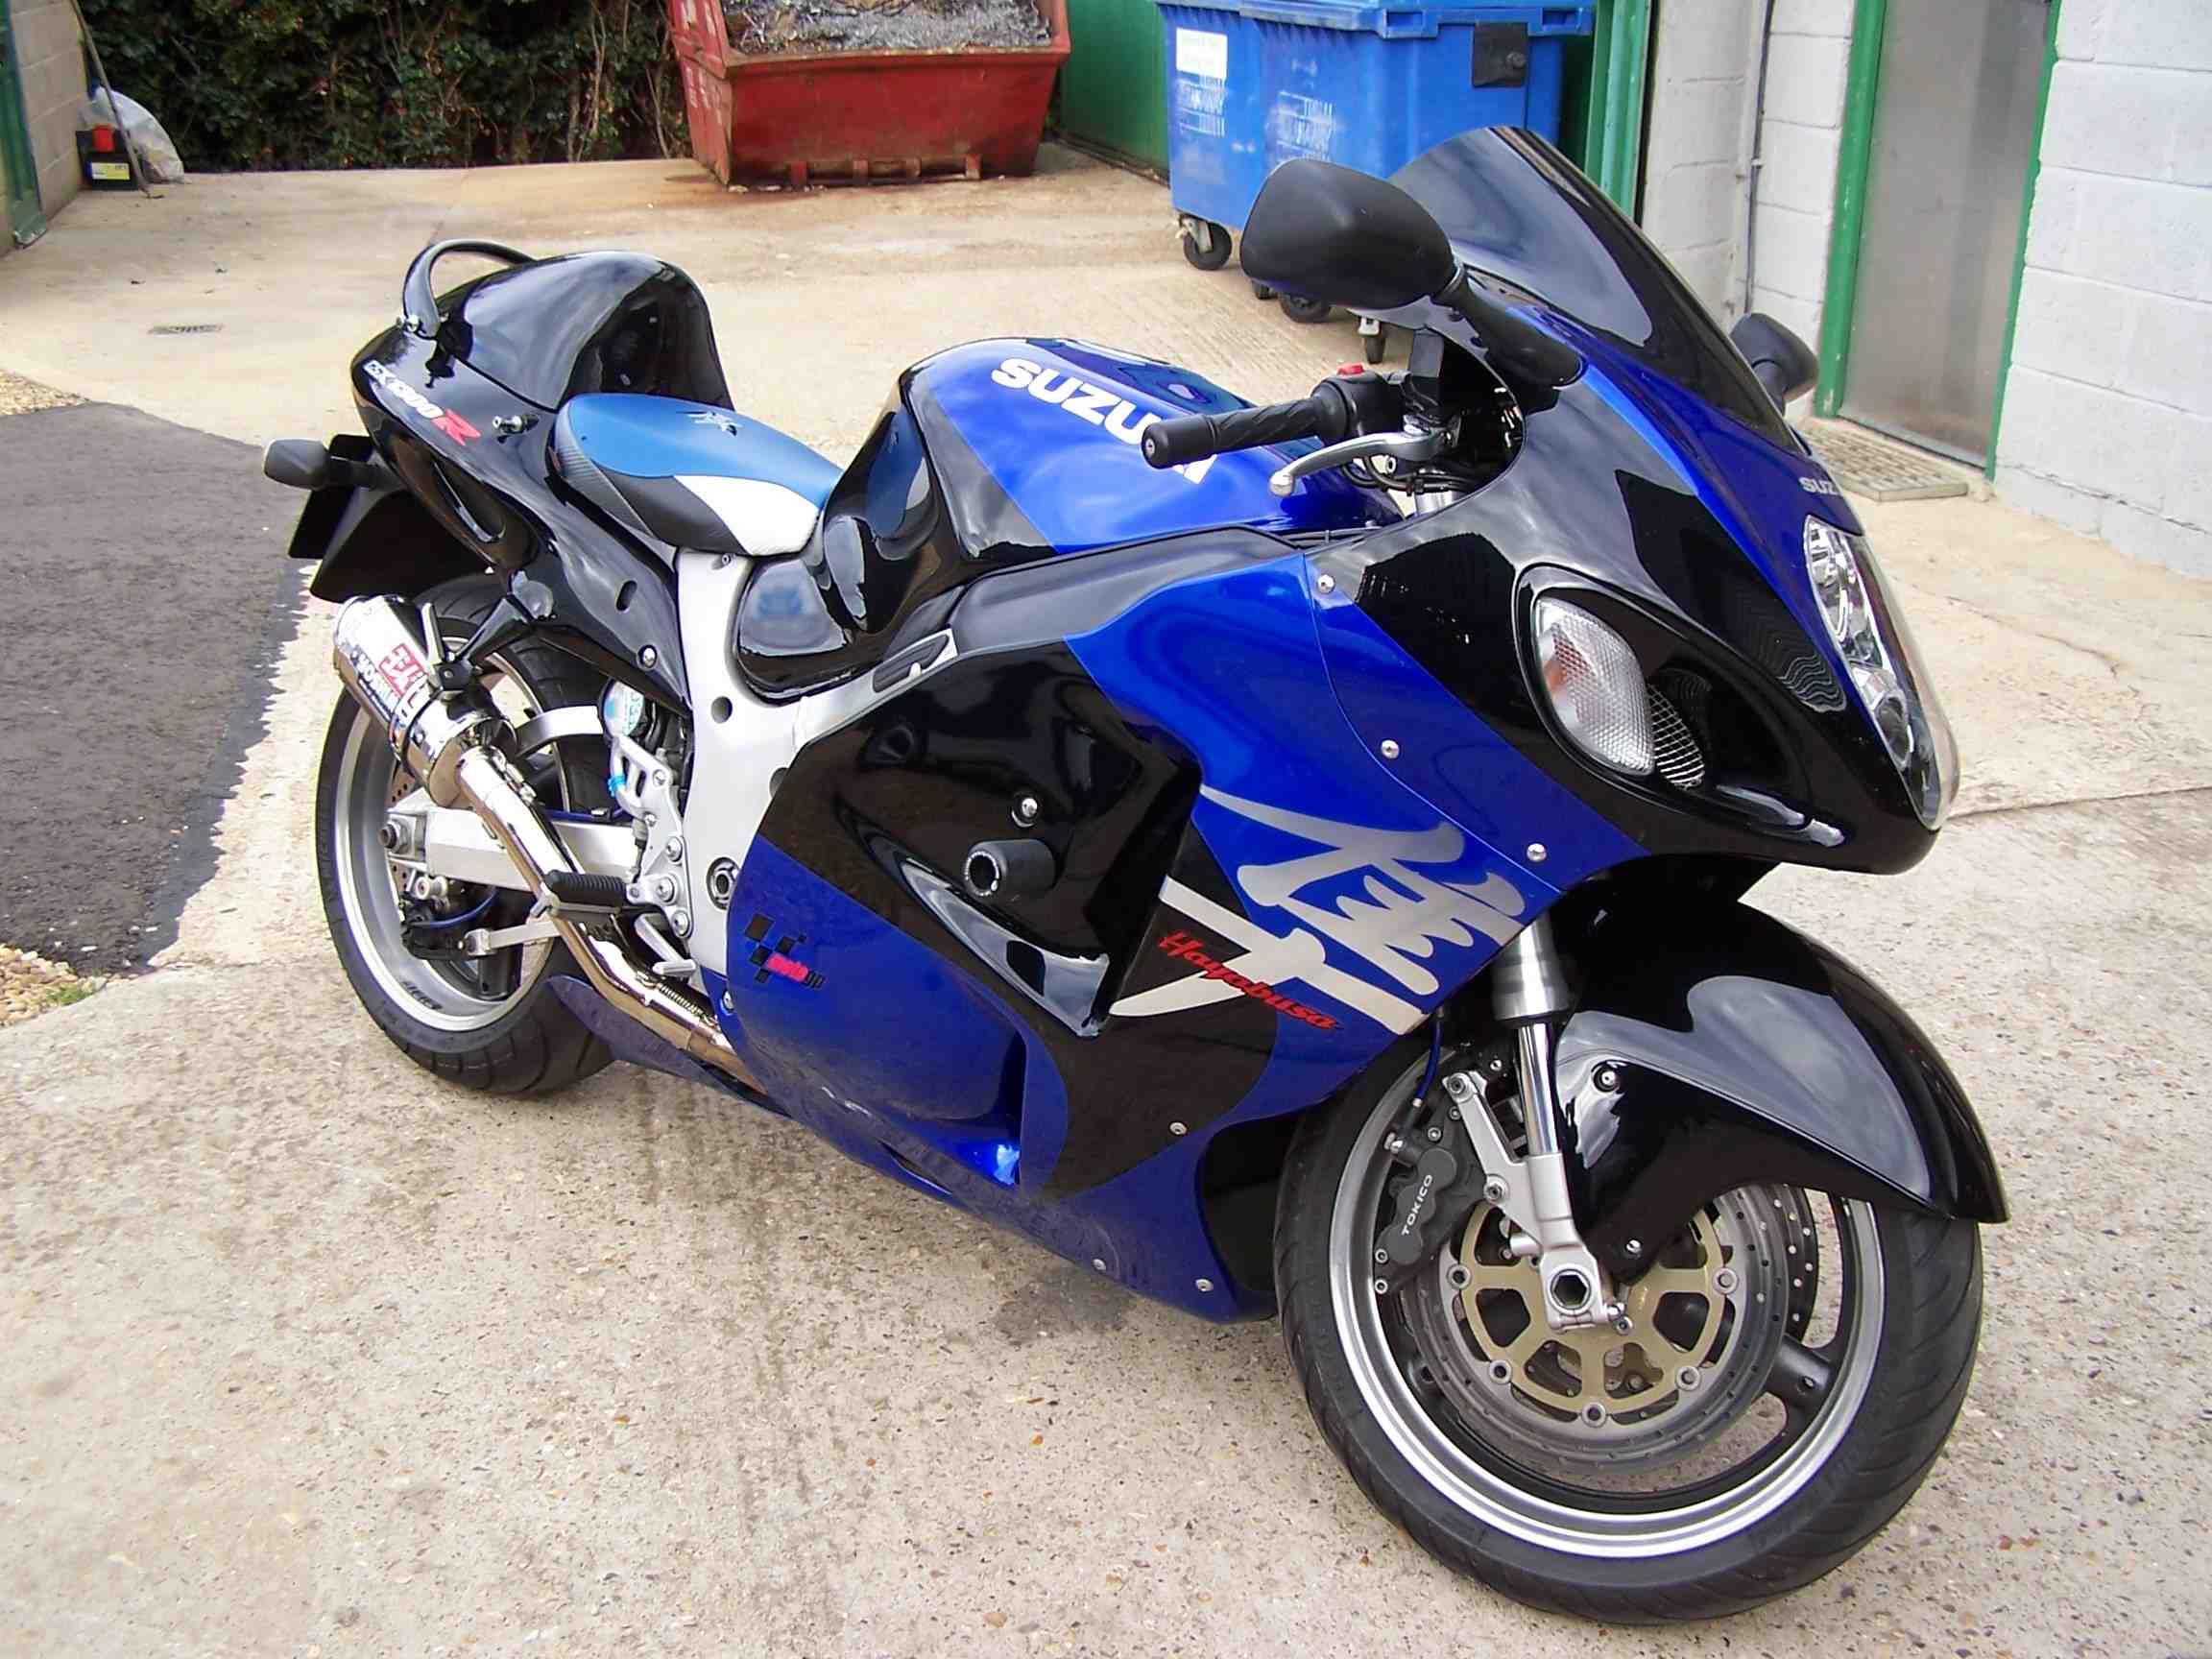 Suzuki GSX1300R Hayabusa Motorcycle Workshop Service Repair Manual 1999-2000